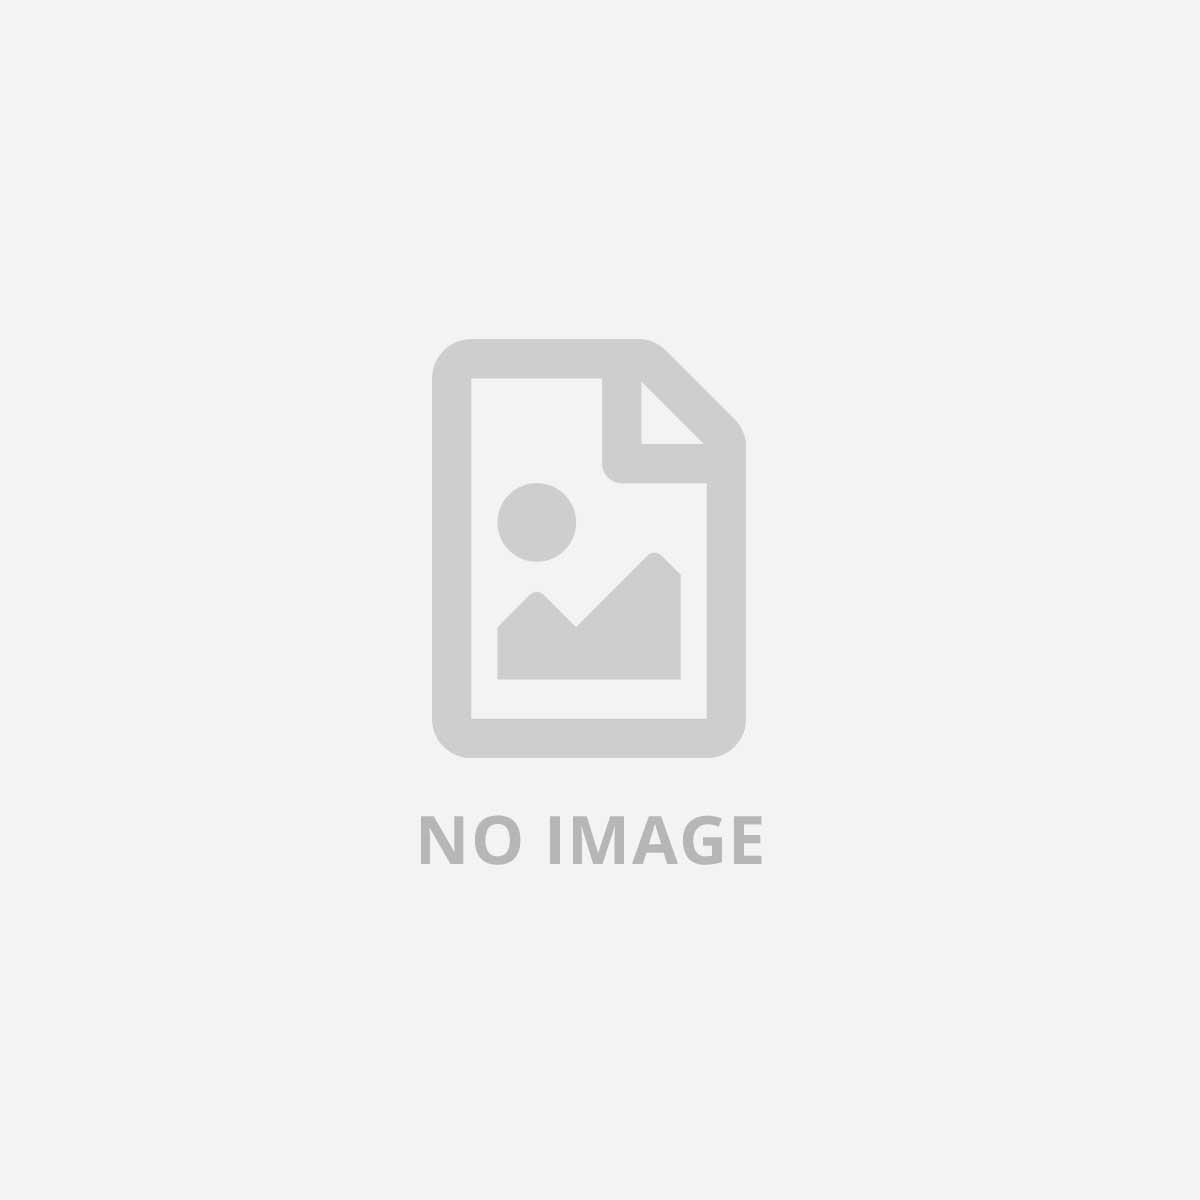 HAMLET LETTORE SMART CARD USB 3.0